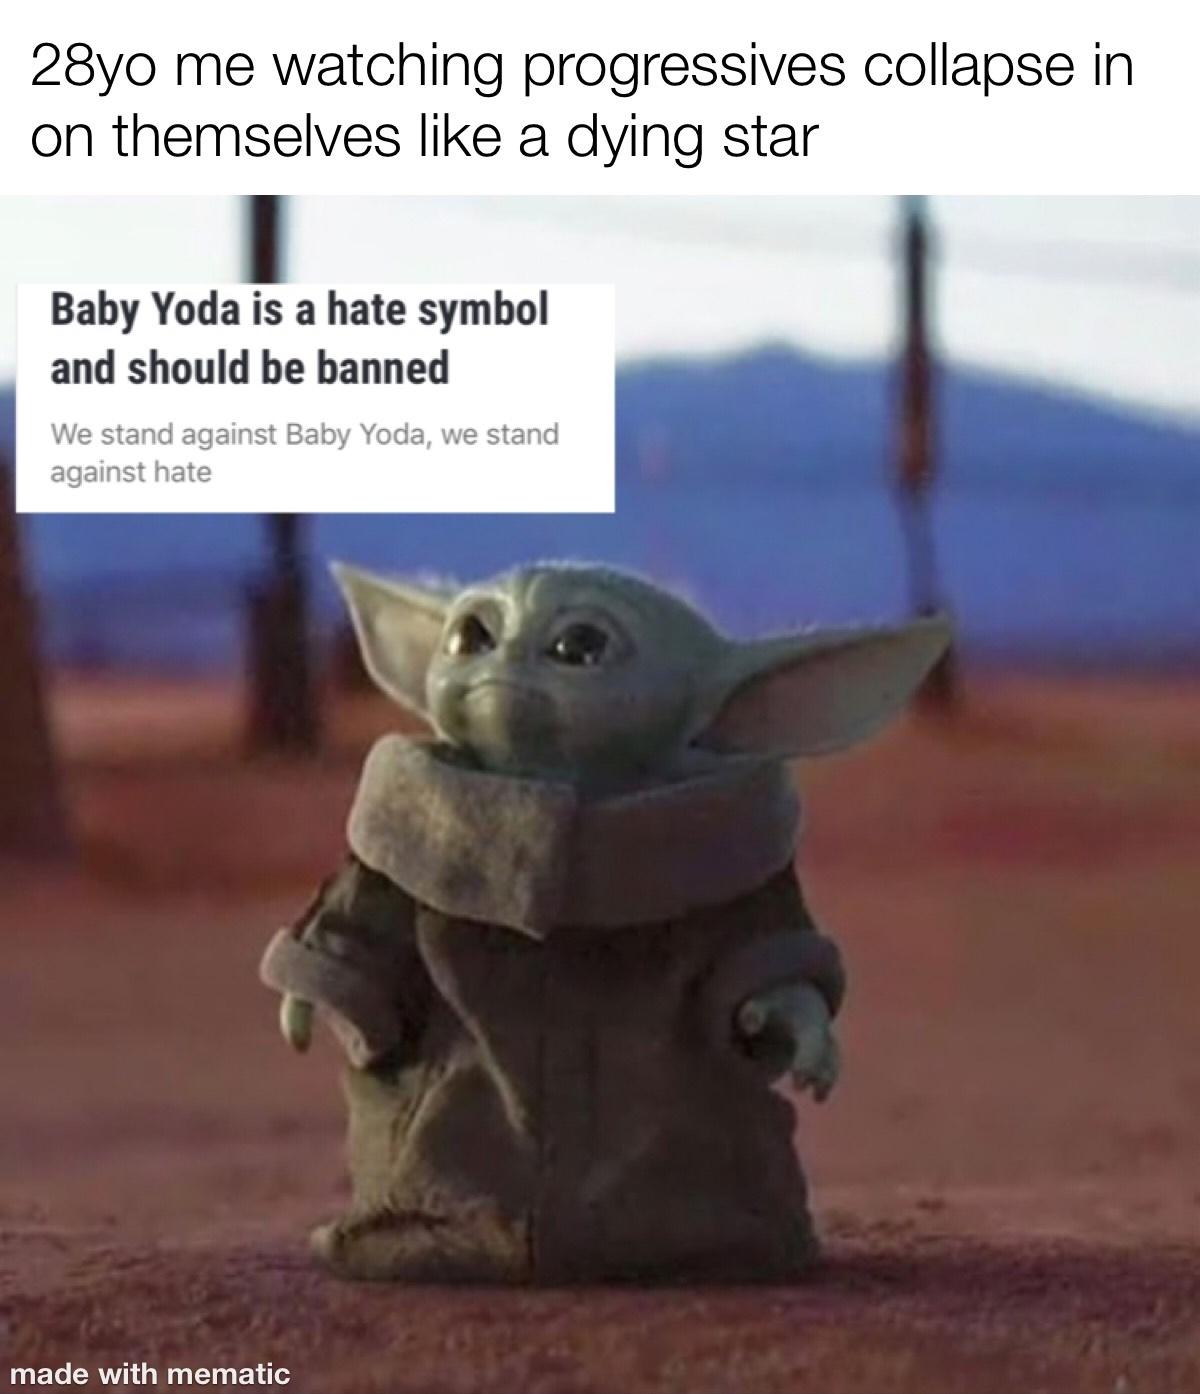 2020 Victim olympics Tokyo - meme